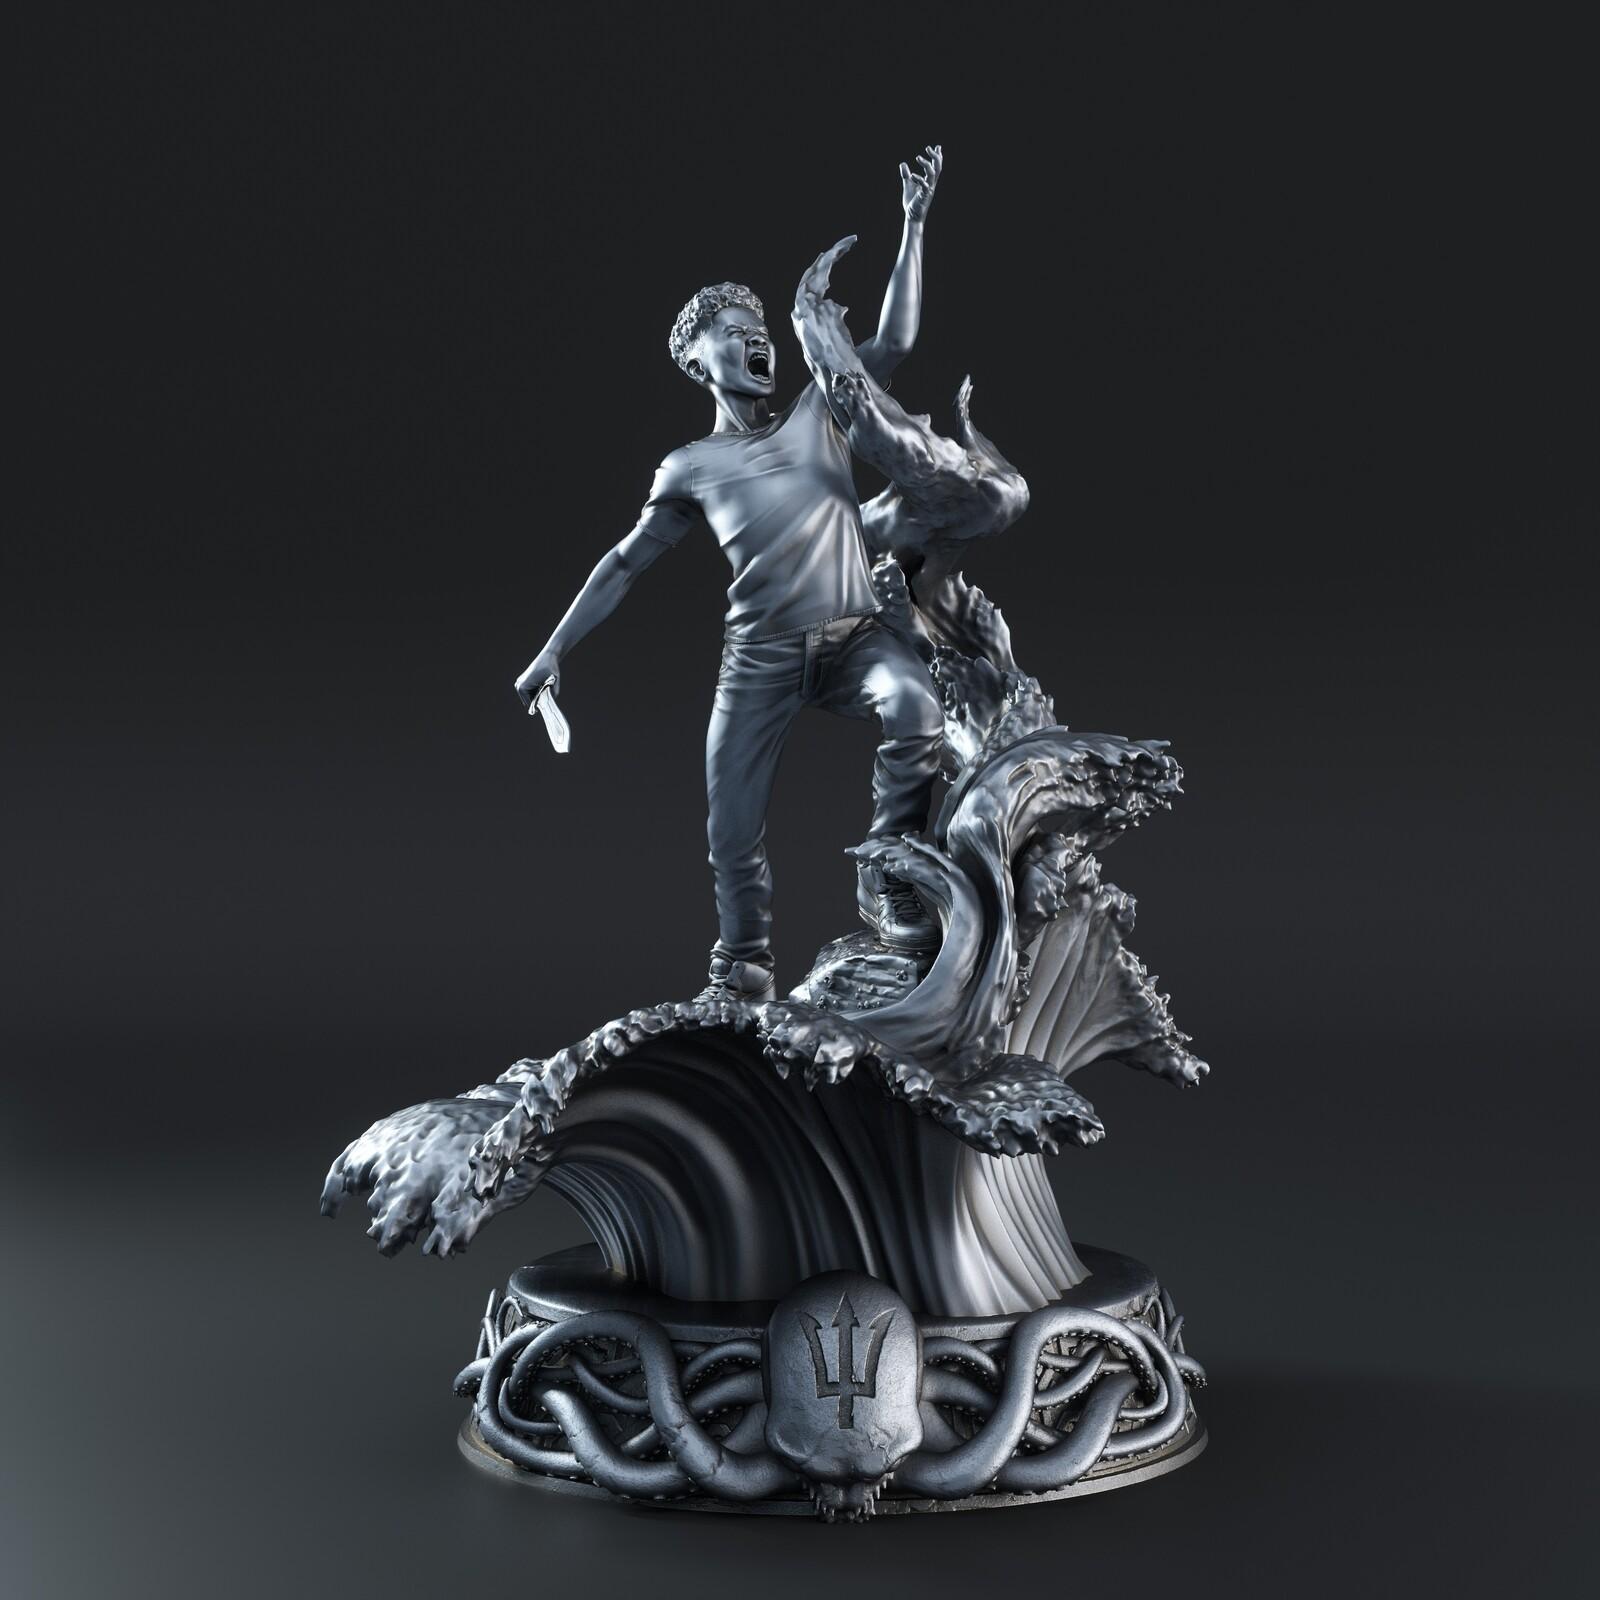 Percy Jackson Statue